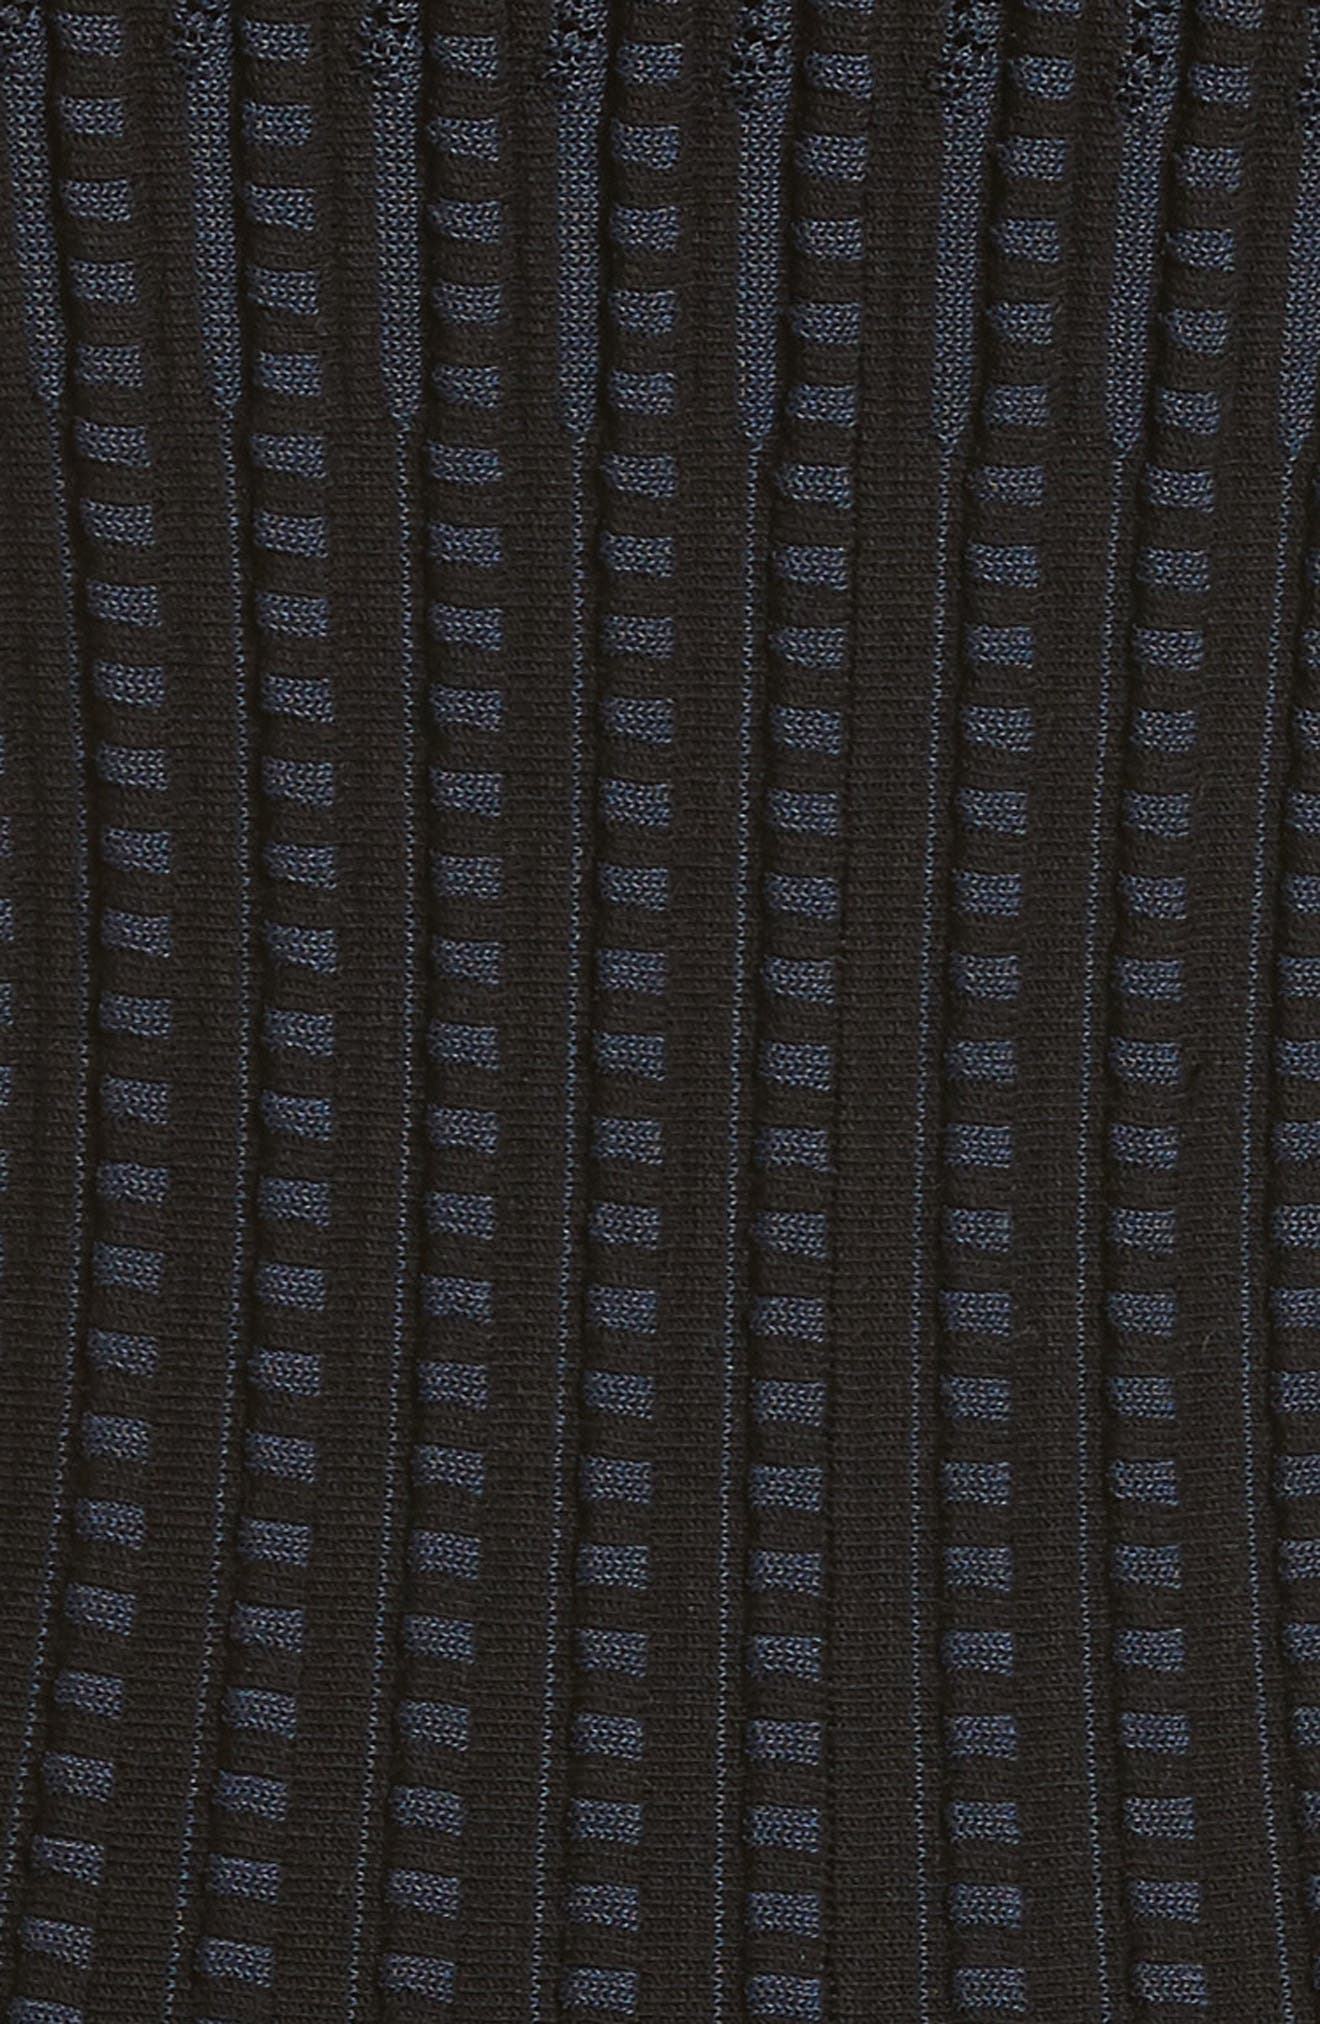 Check Knit Fit & Flare Dress,                             Alternate thumbnail 5, color,                             BLACK/ DEEP NAVY